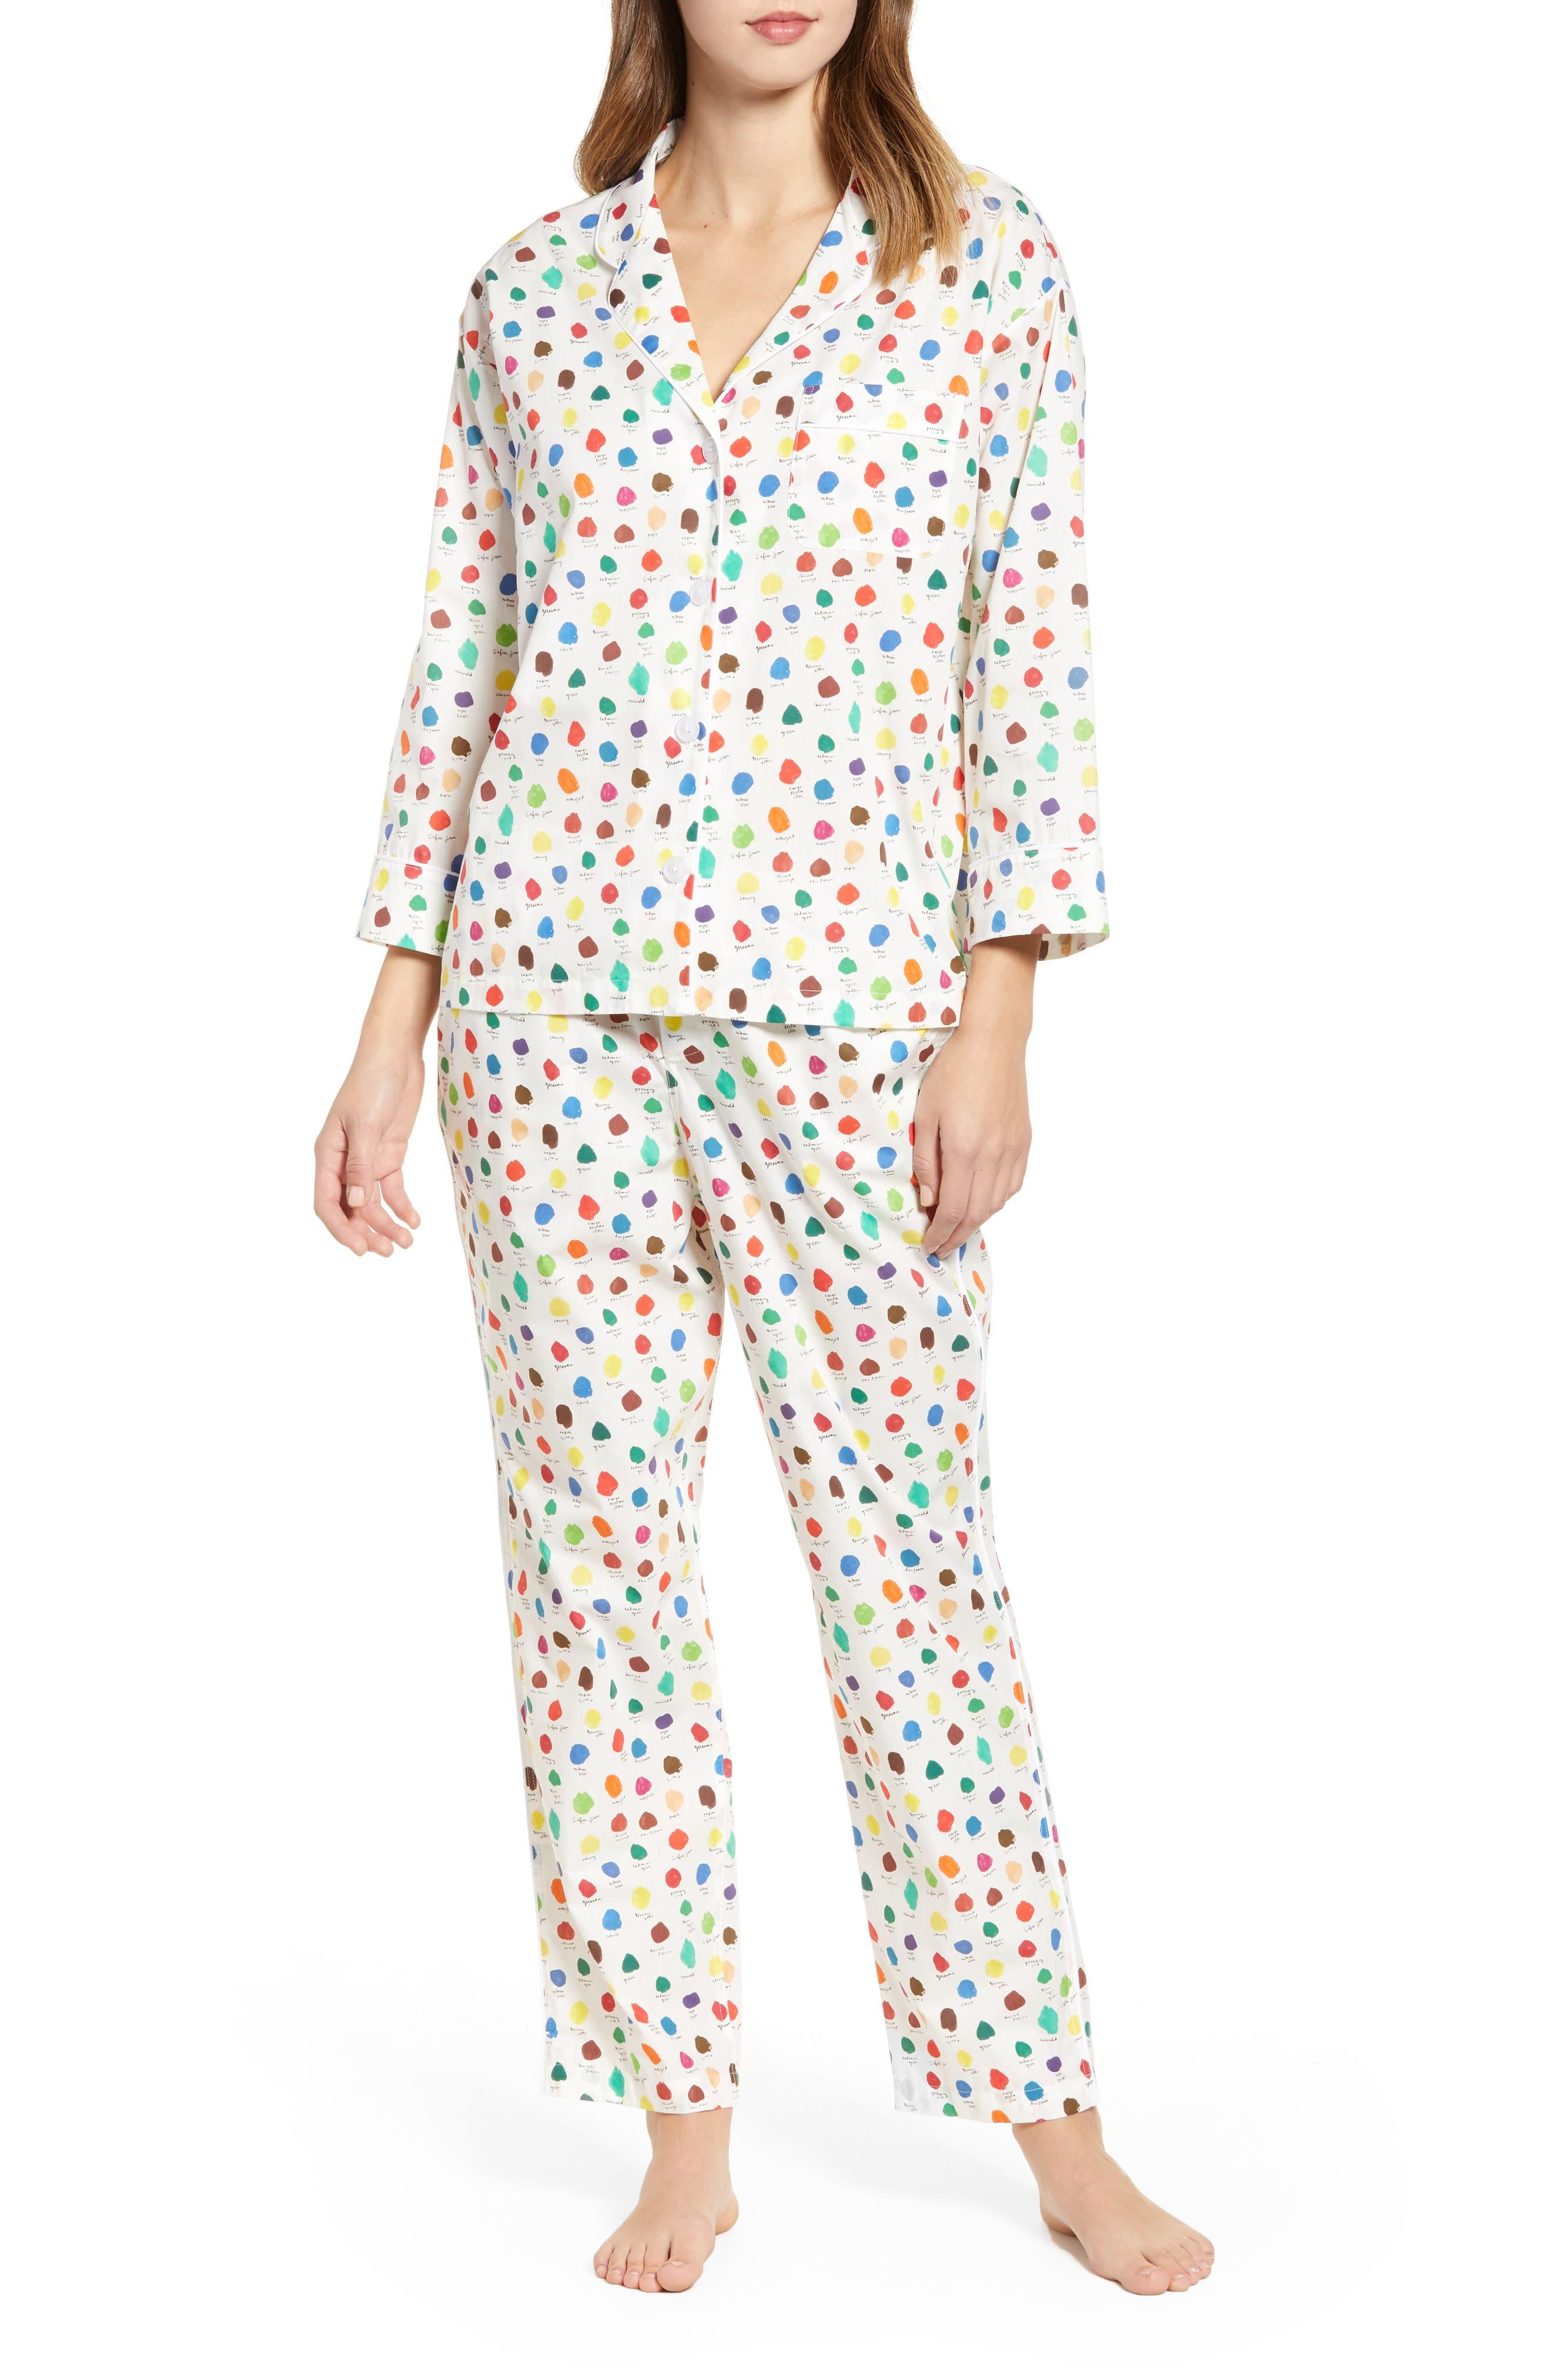 SLEEPY JONES Pajamas in Cream